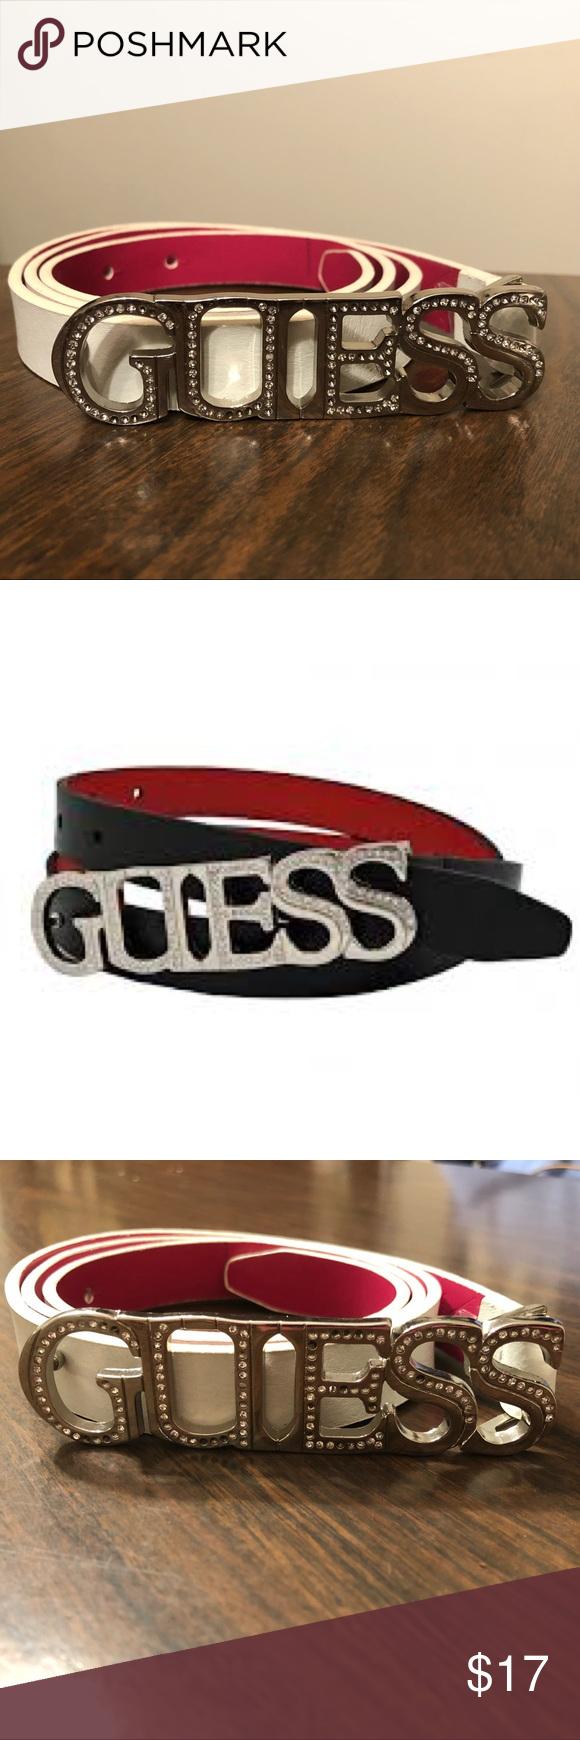 3 24 Guess Rhinestone Leather Belt Leather Belt Leather Belt